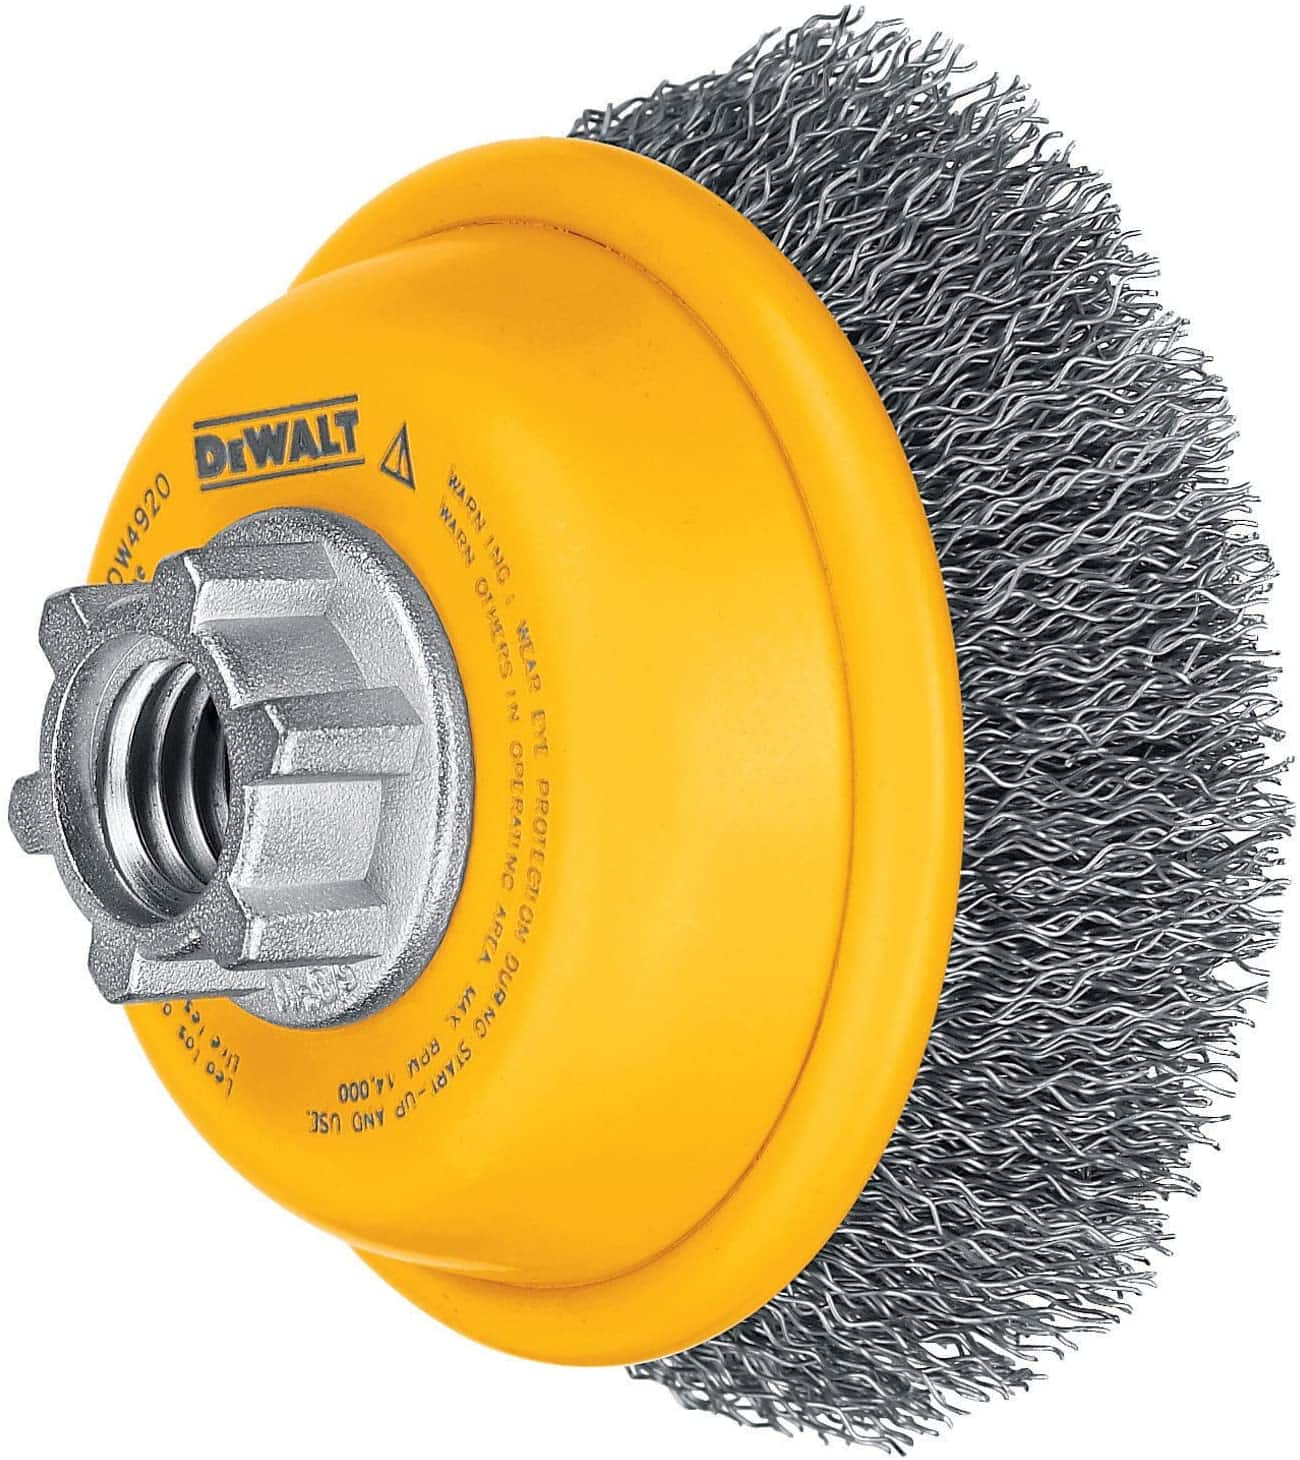 DEWALT Wire Cup Brush, Crimped, 3-Inch (DW4920) - Amazon - $5.41